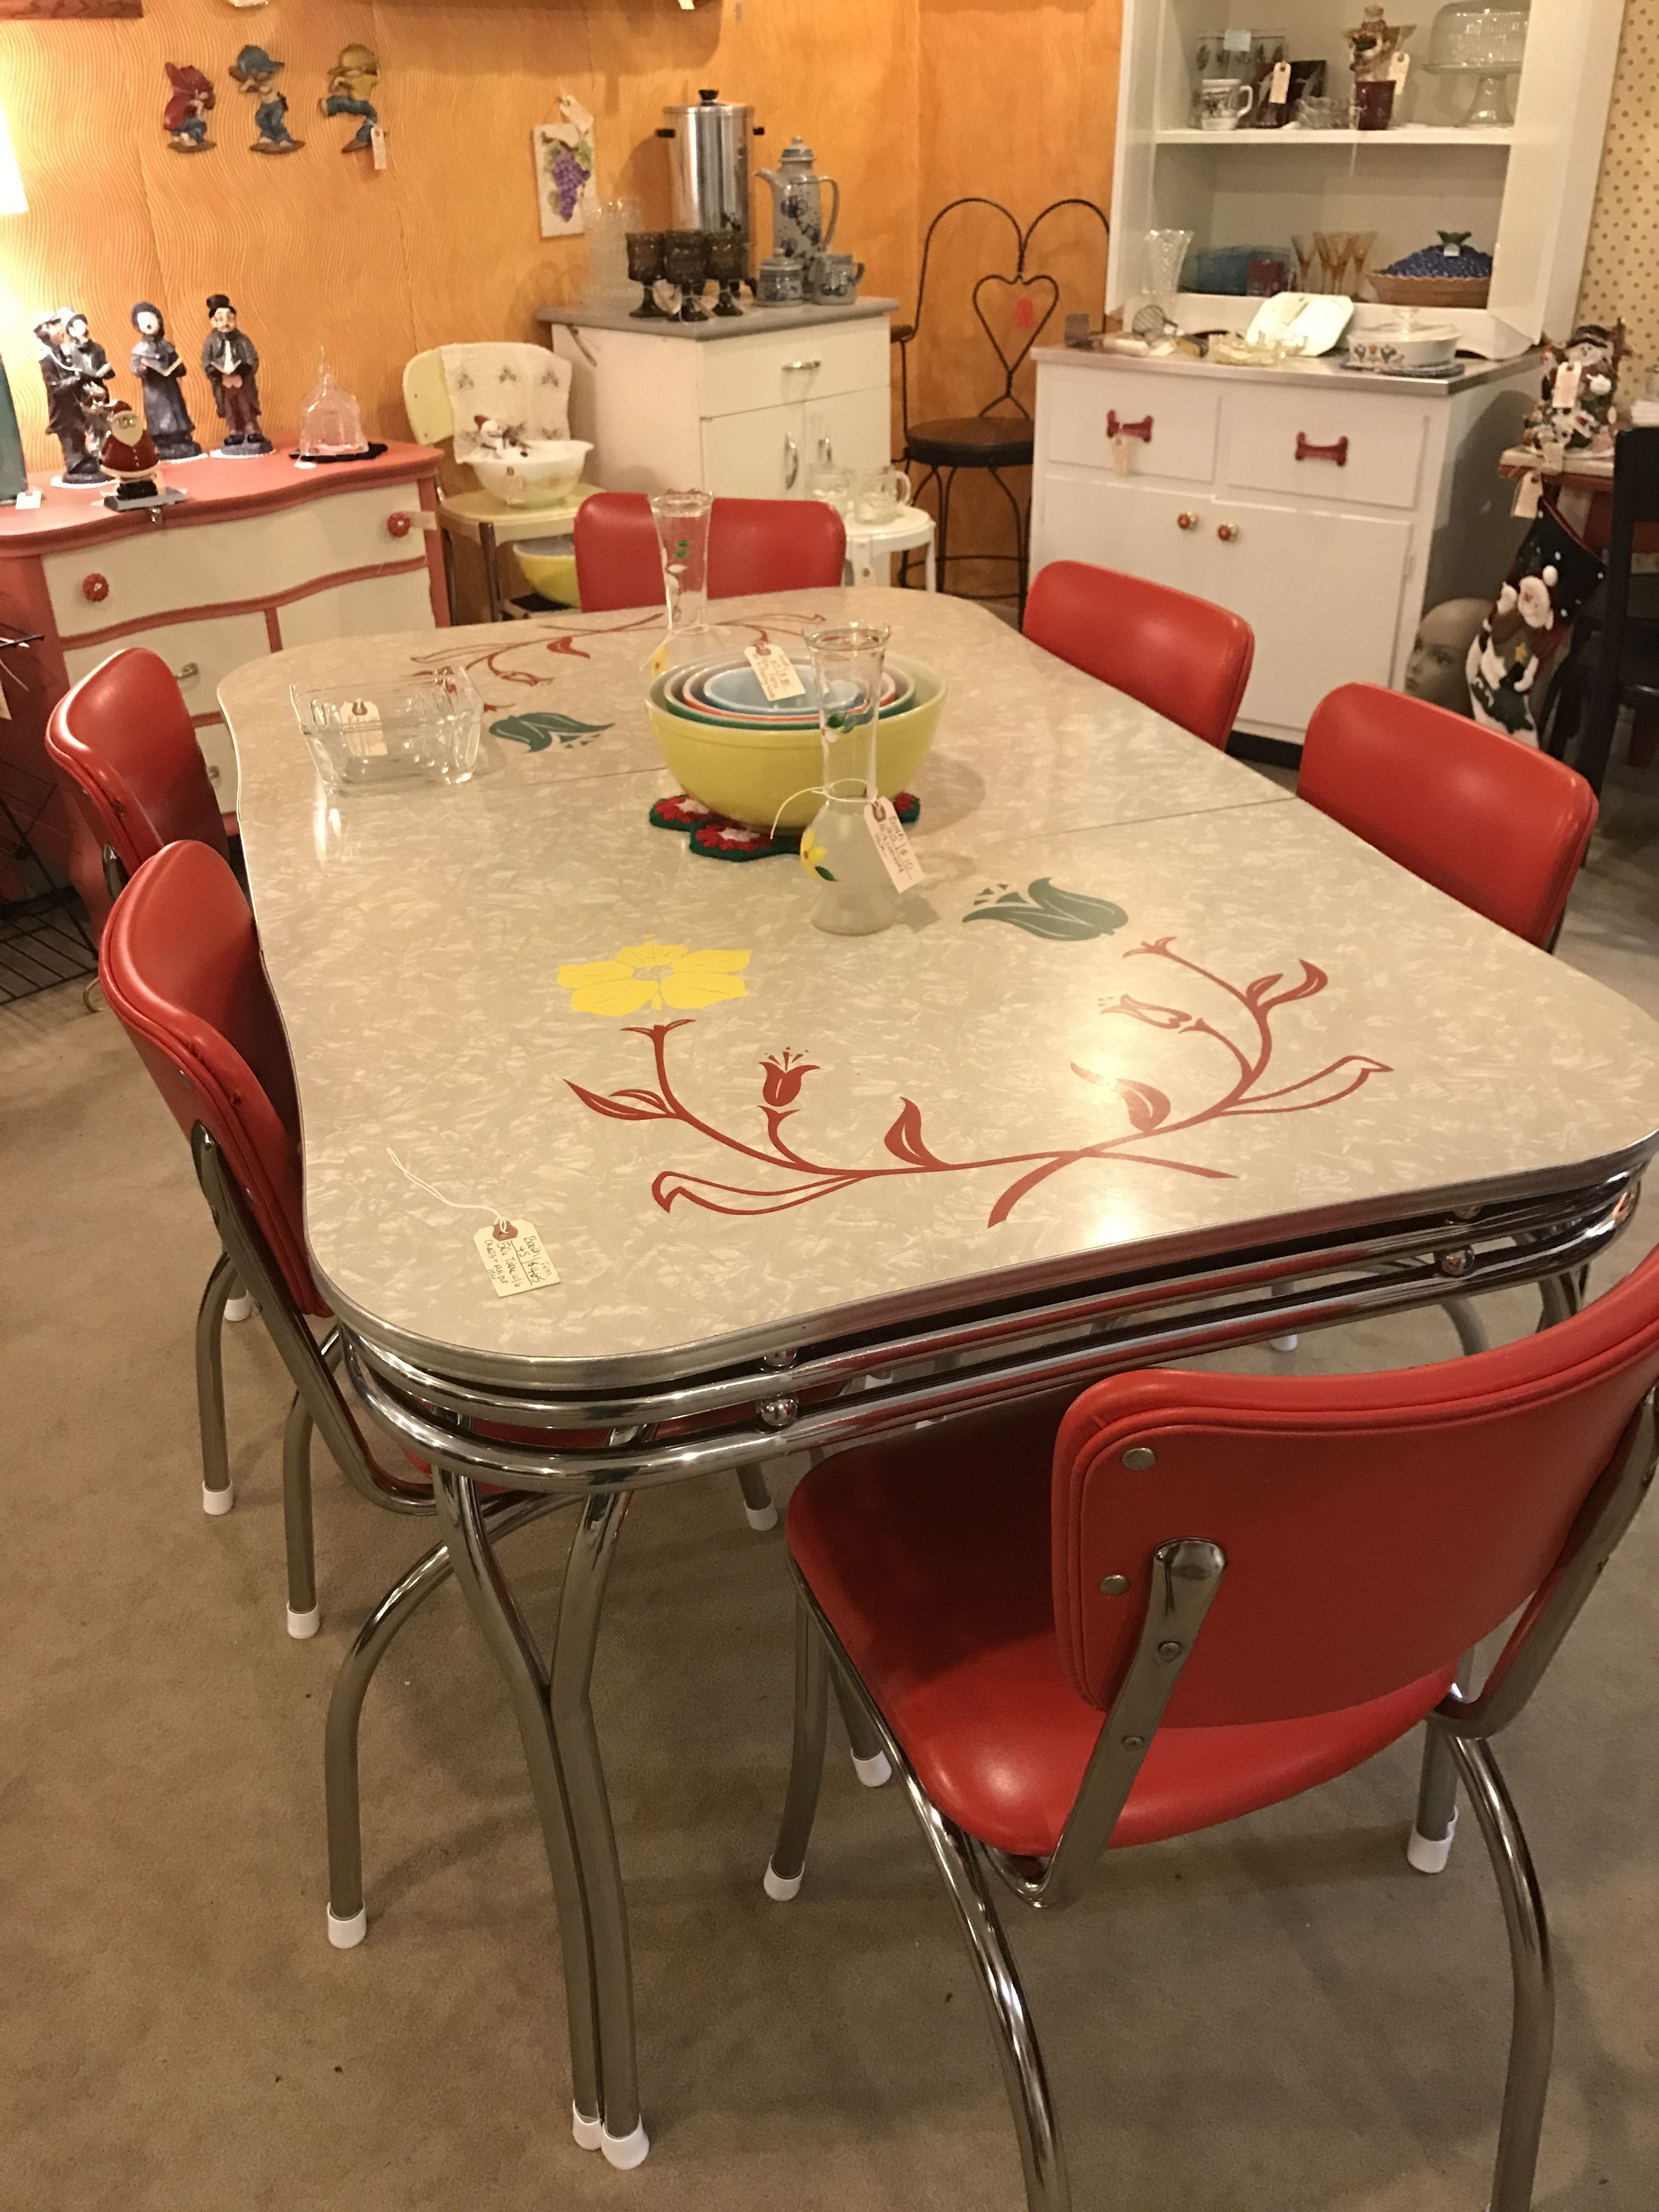 Beautiful vintage Formica table